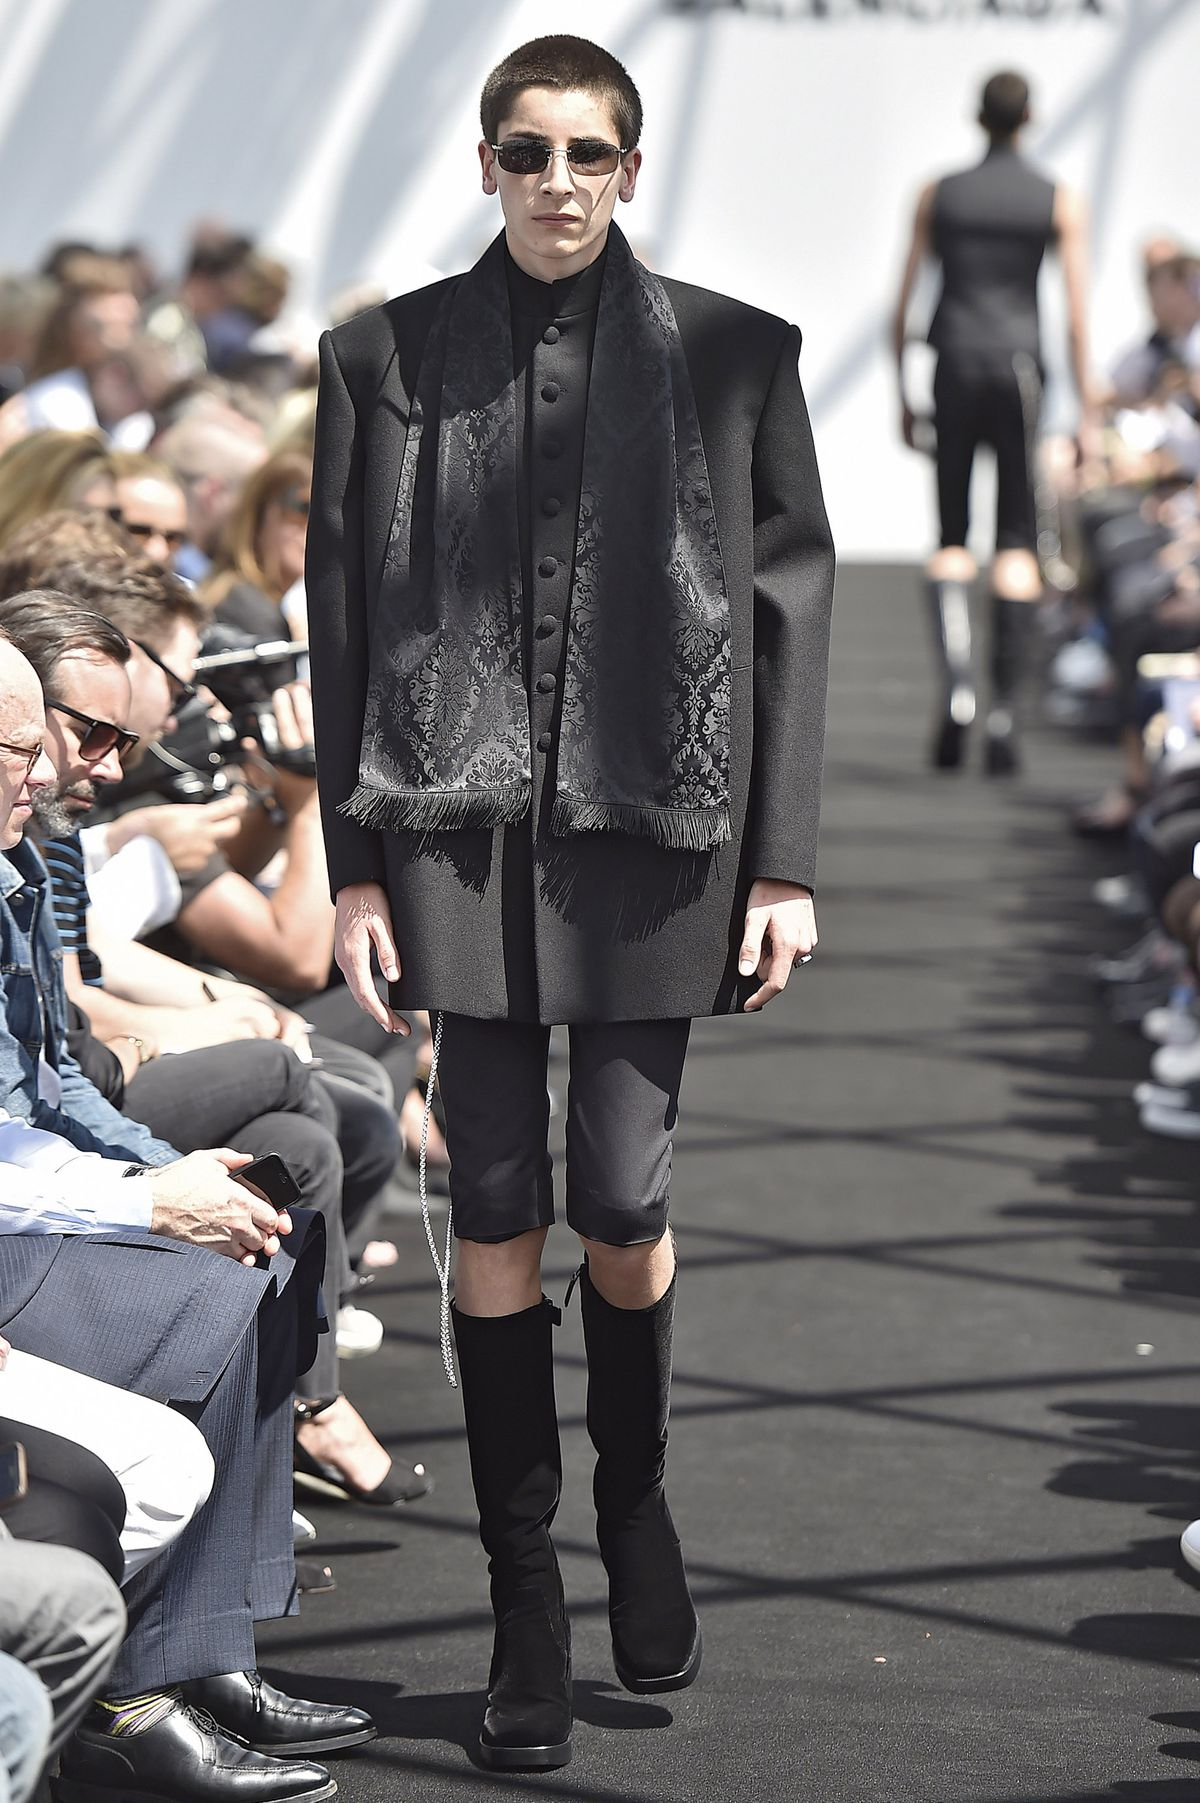 A model walks the runway at Balenciaga's spring 2017 menswear show wearing an oversize jacket and super-skinny black pants.